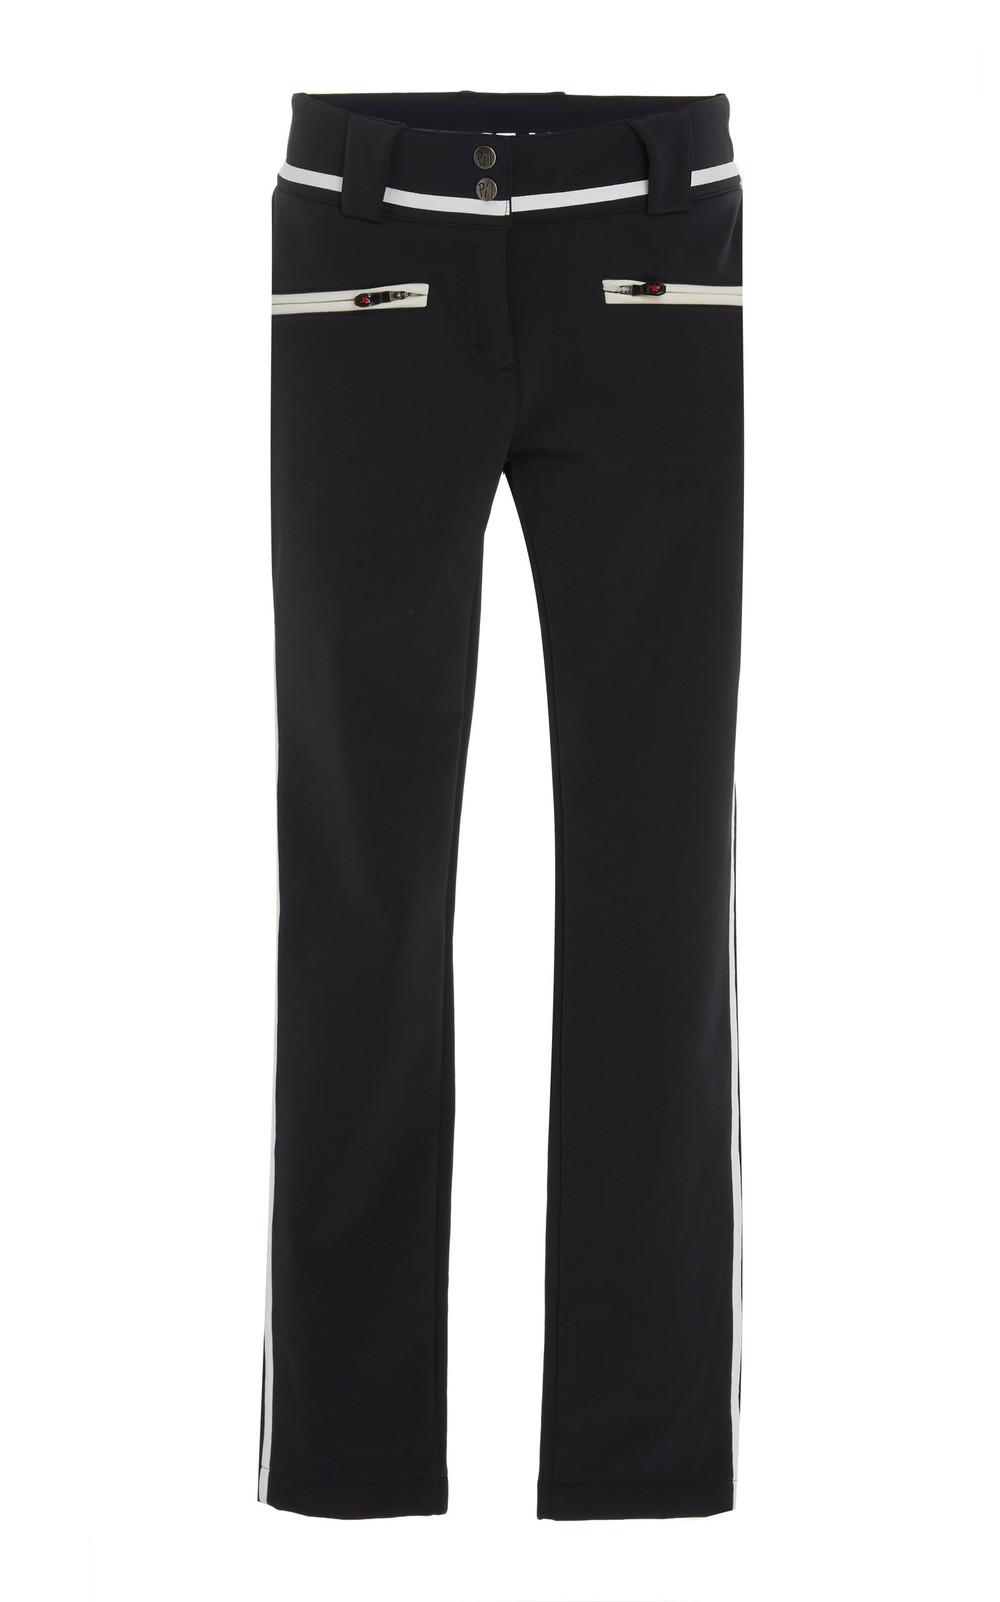 Perfect Moment Aurora Stretch-Jersey Skinny Ski Pants in black